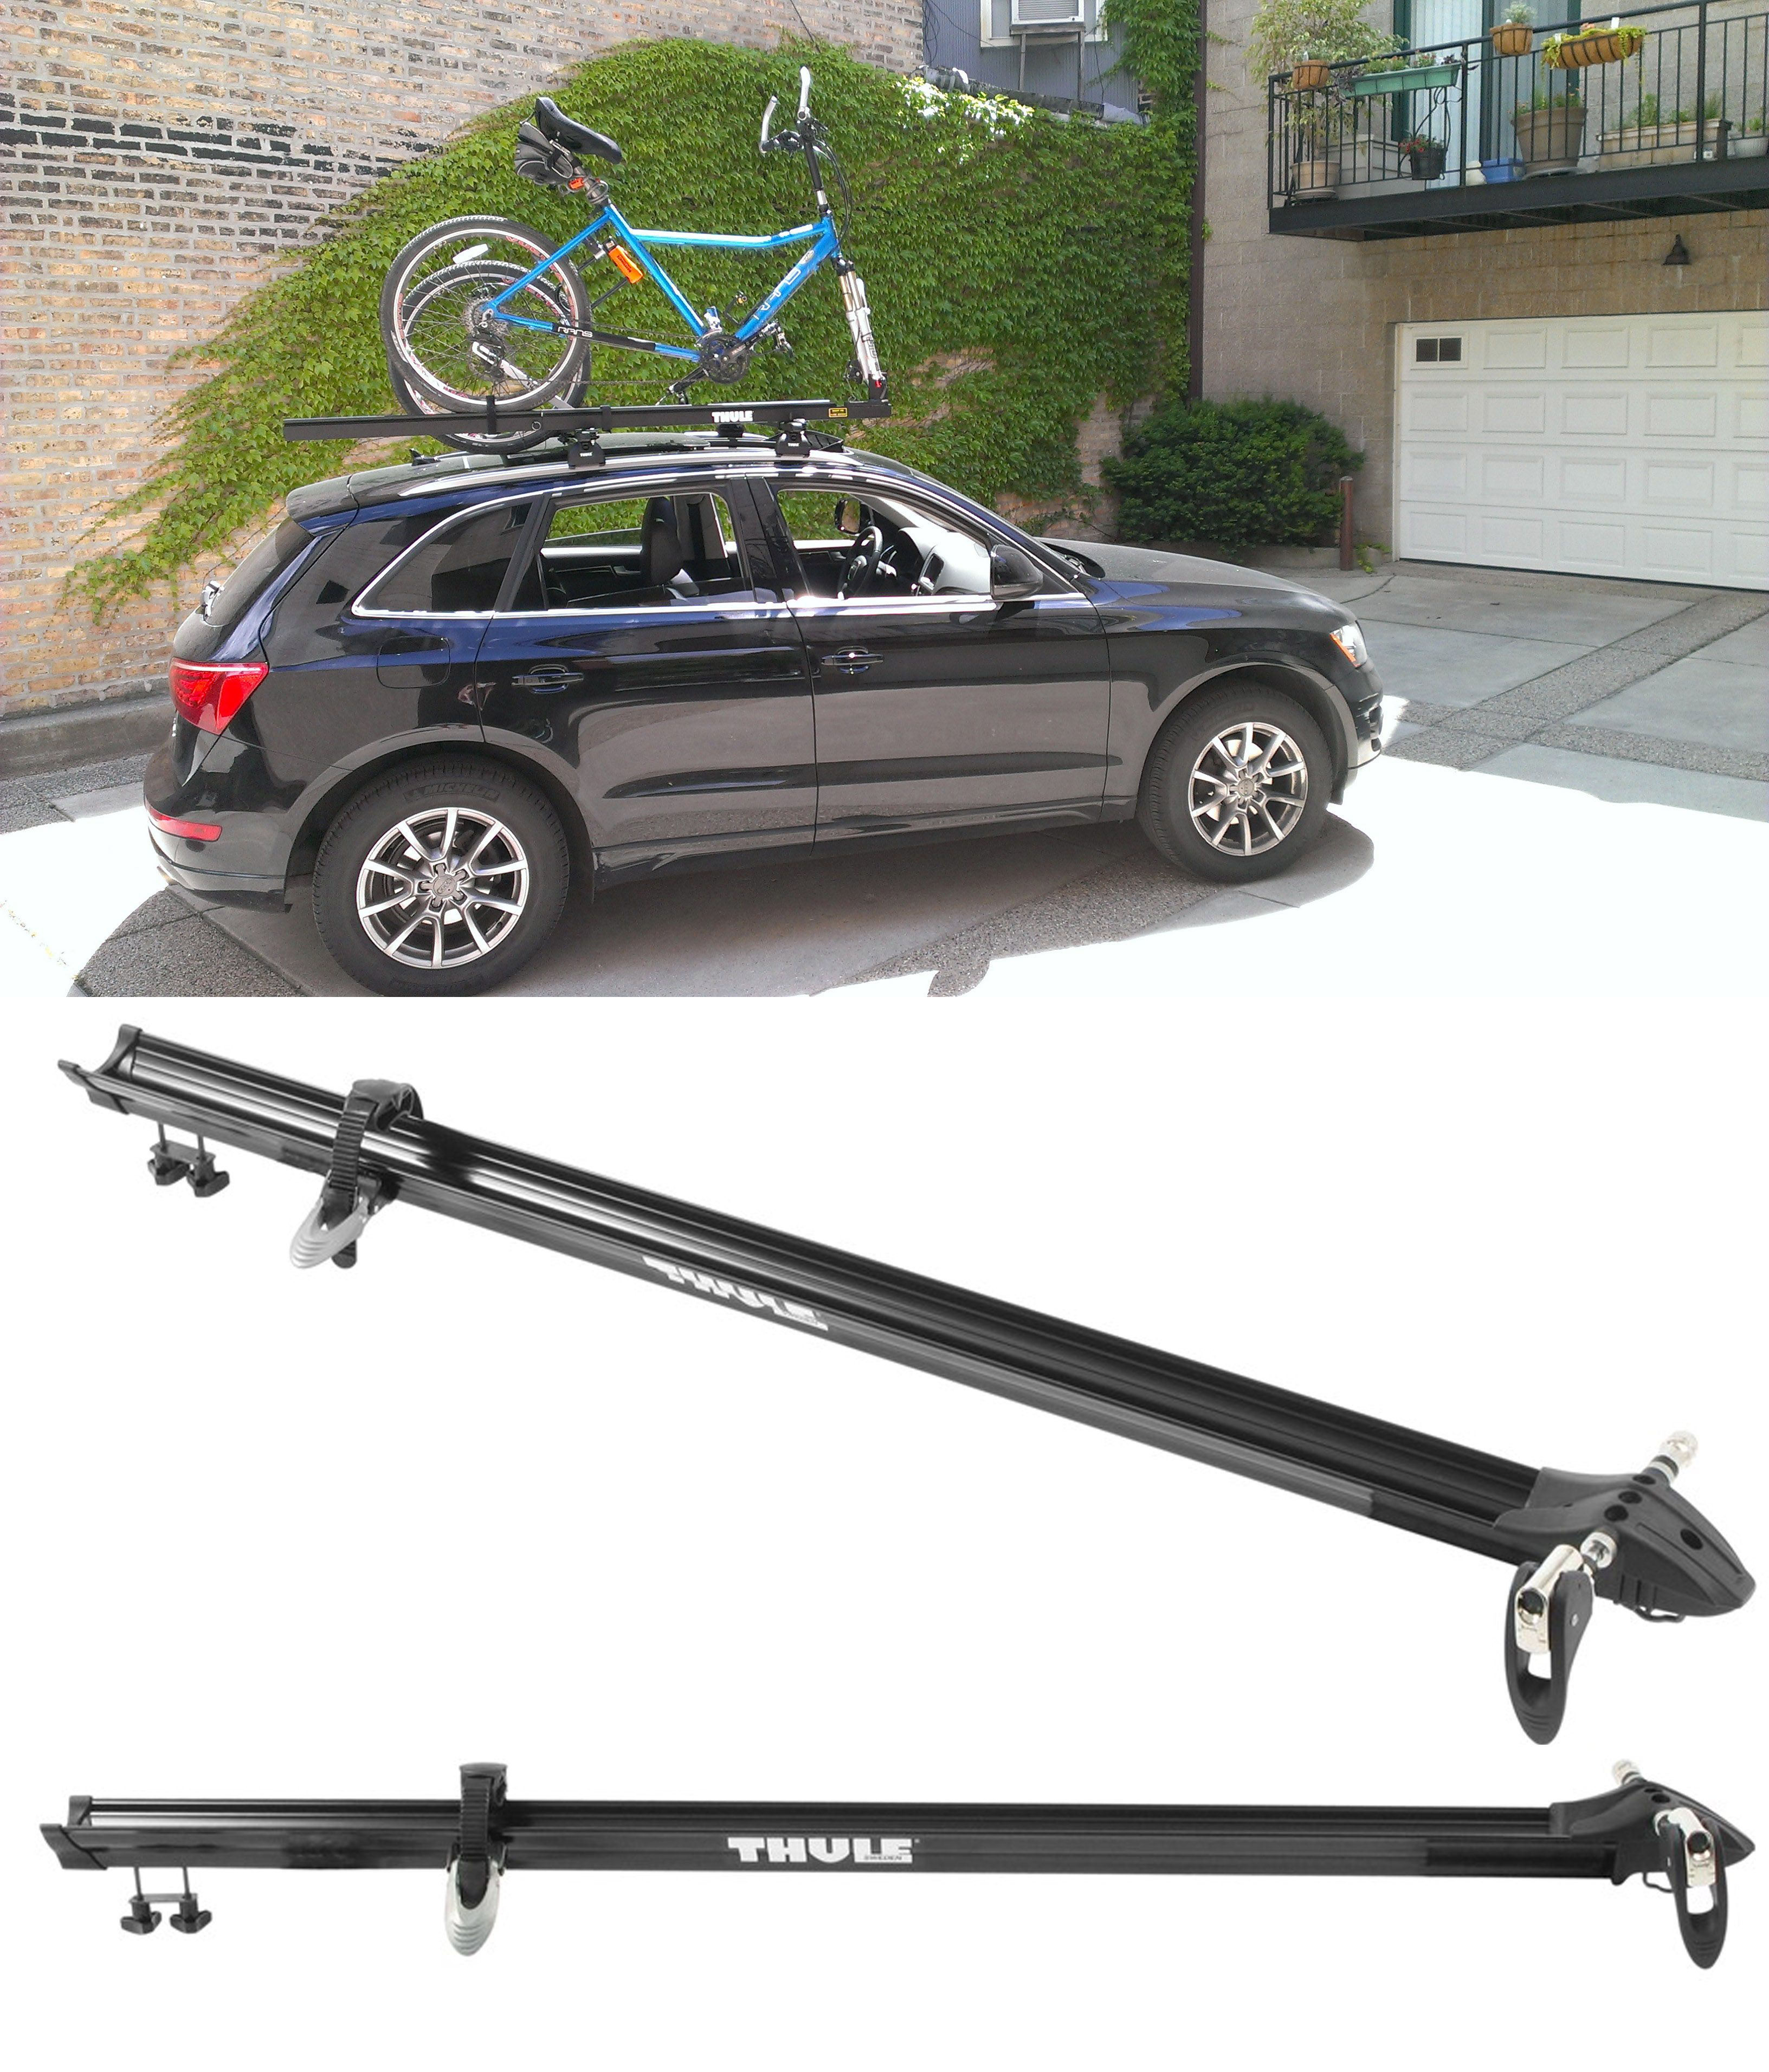 images rack bike products car for aluminum product racks hi image rear bag cars performance